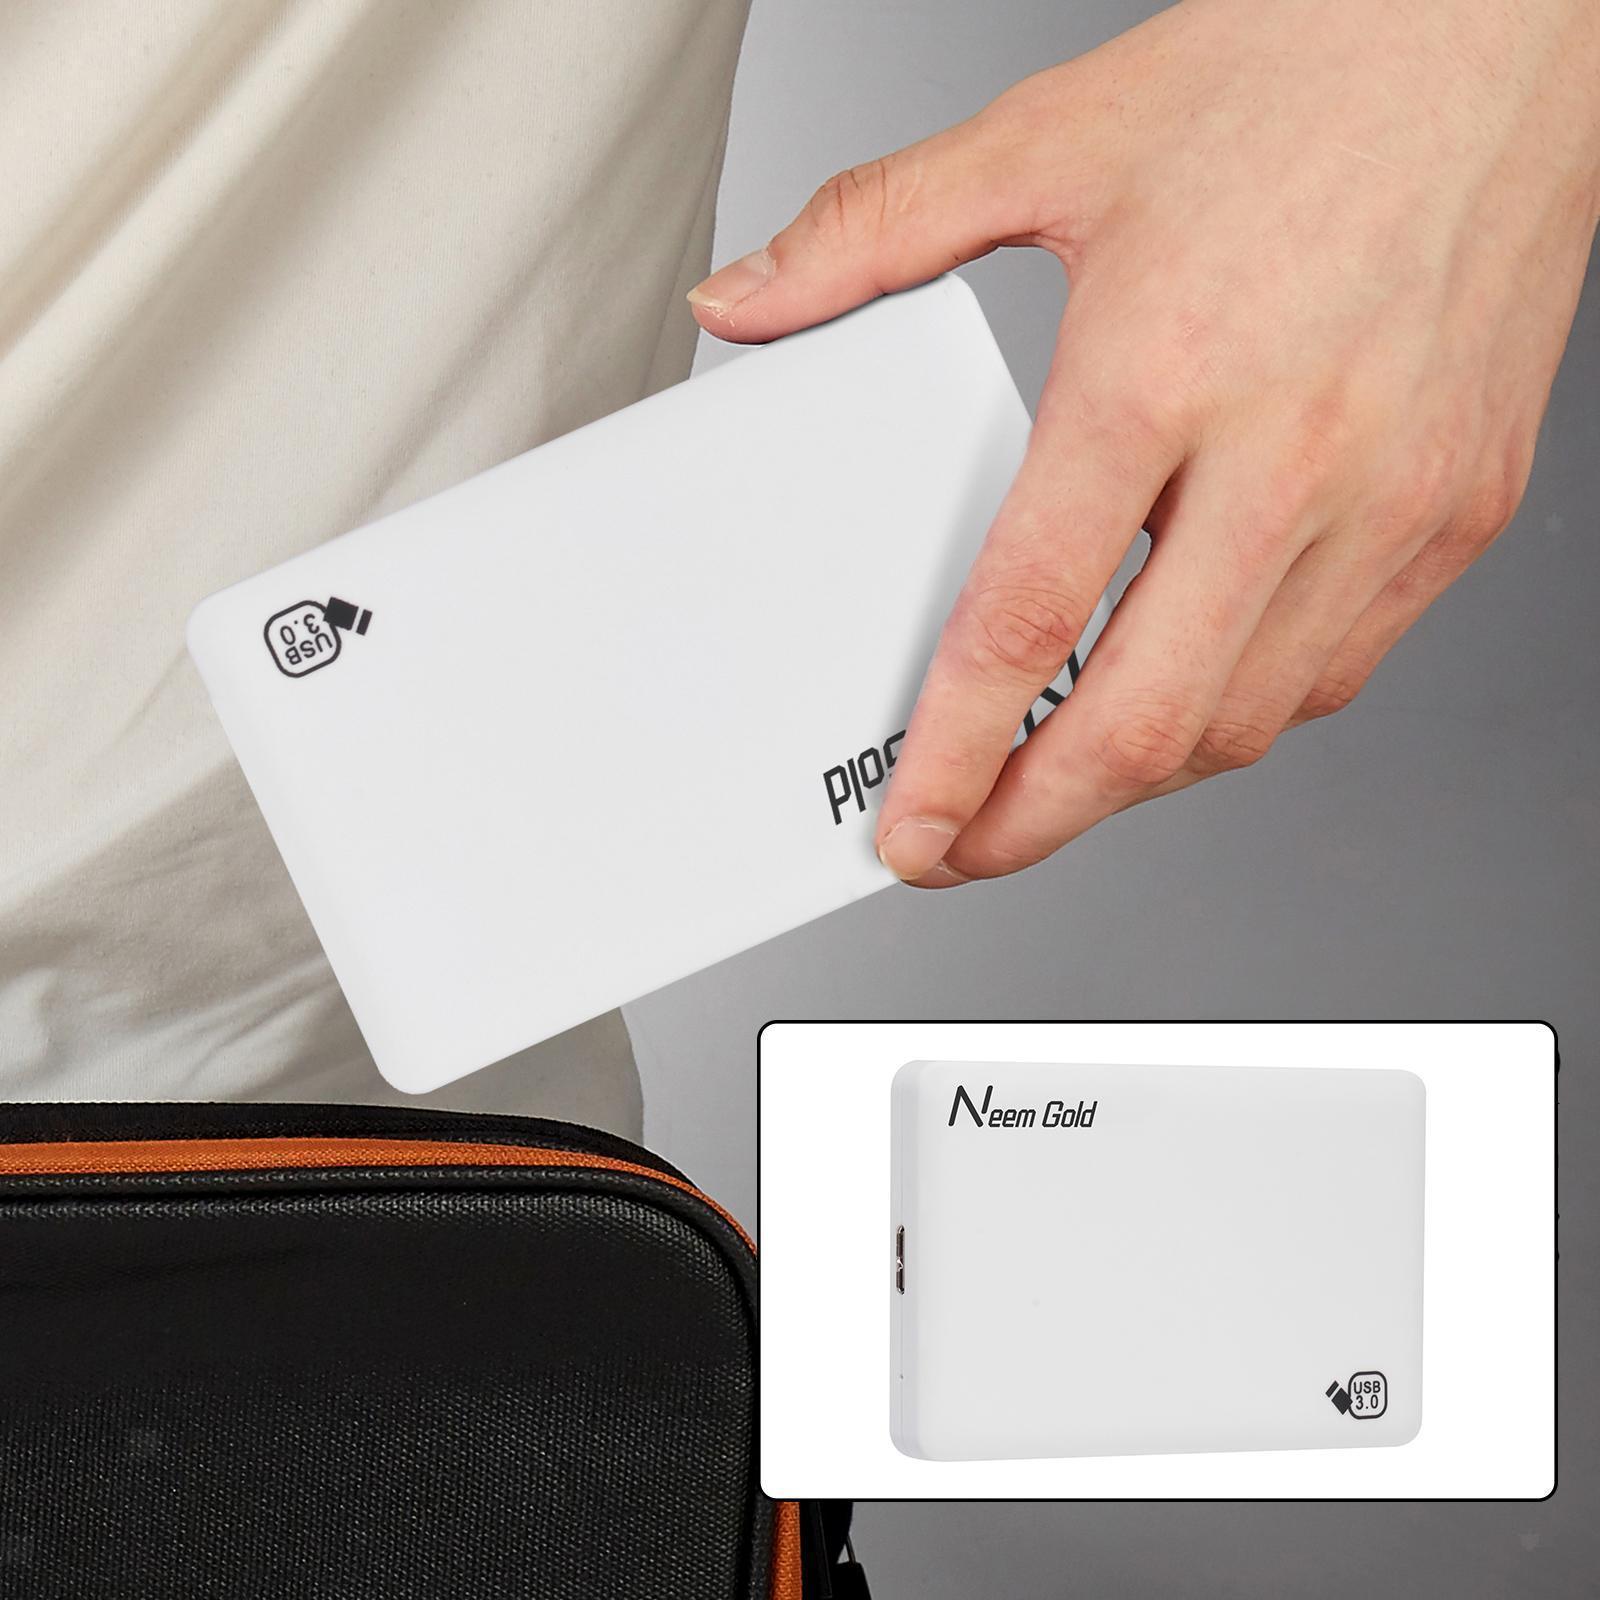 miniature 6 - ABS External Portable USB 3.0 Hard Drive Disk HDD for Desktop Laptop New